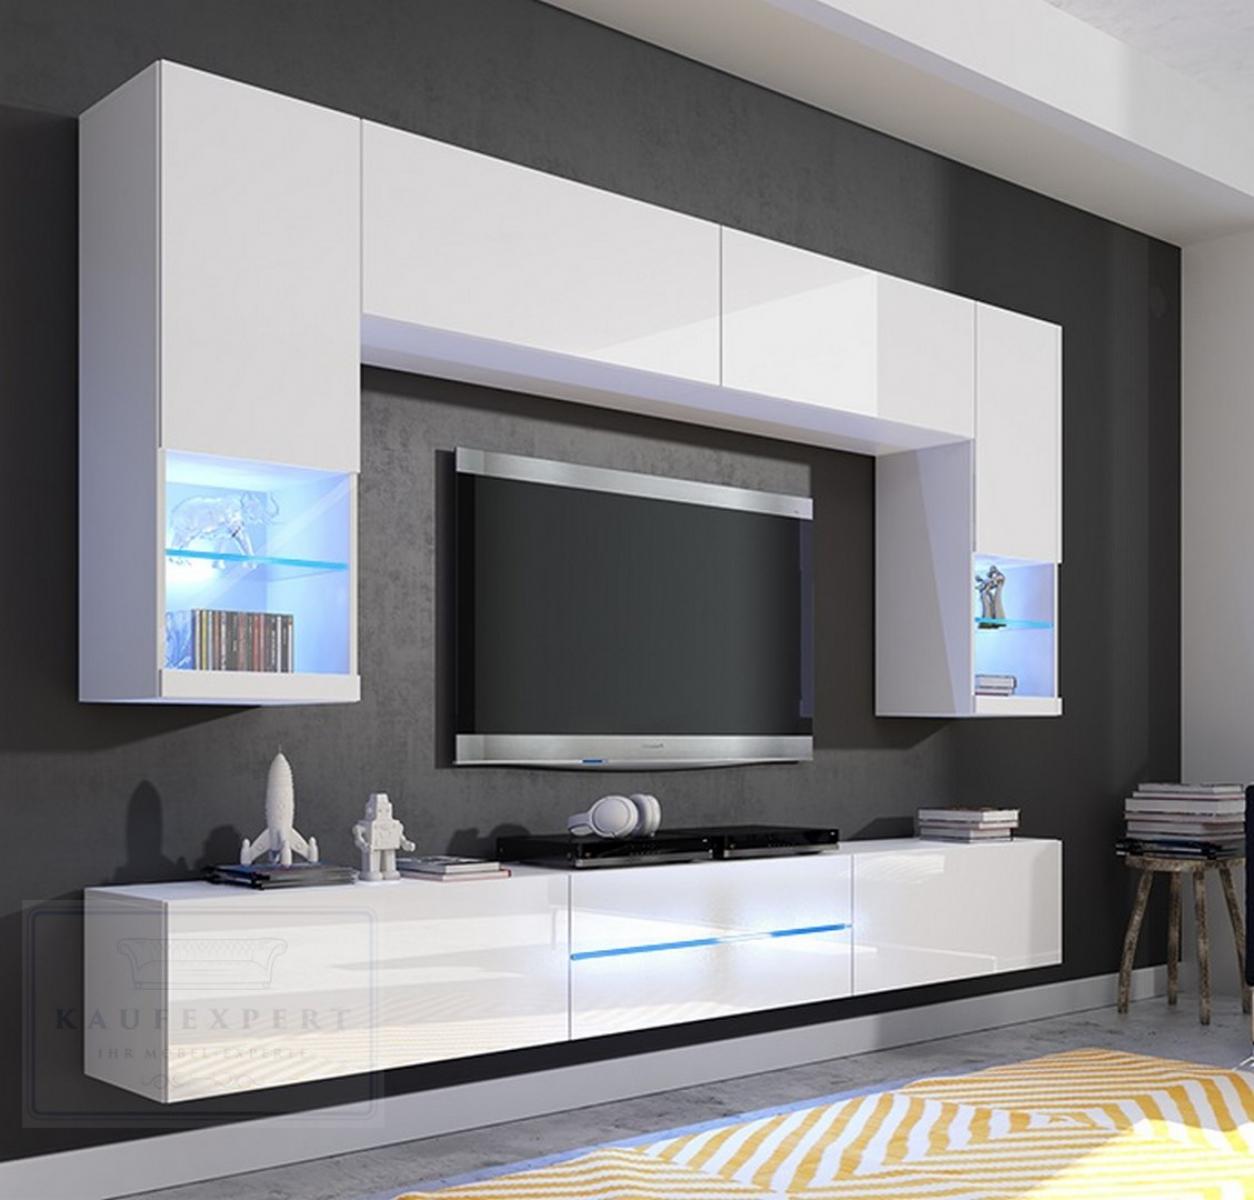 Wohnwand Anbauwand Weiß Hochglanz Mediawand Design LED Beleuchtung